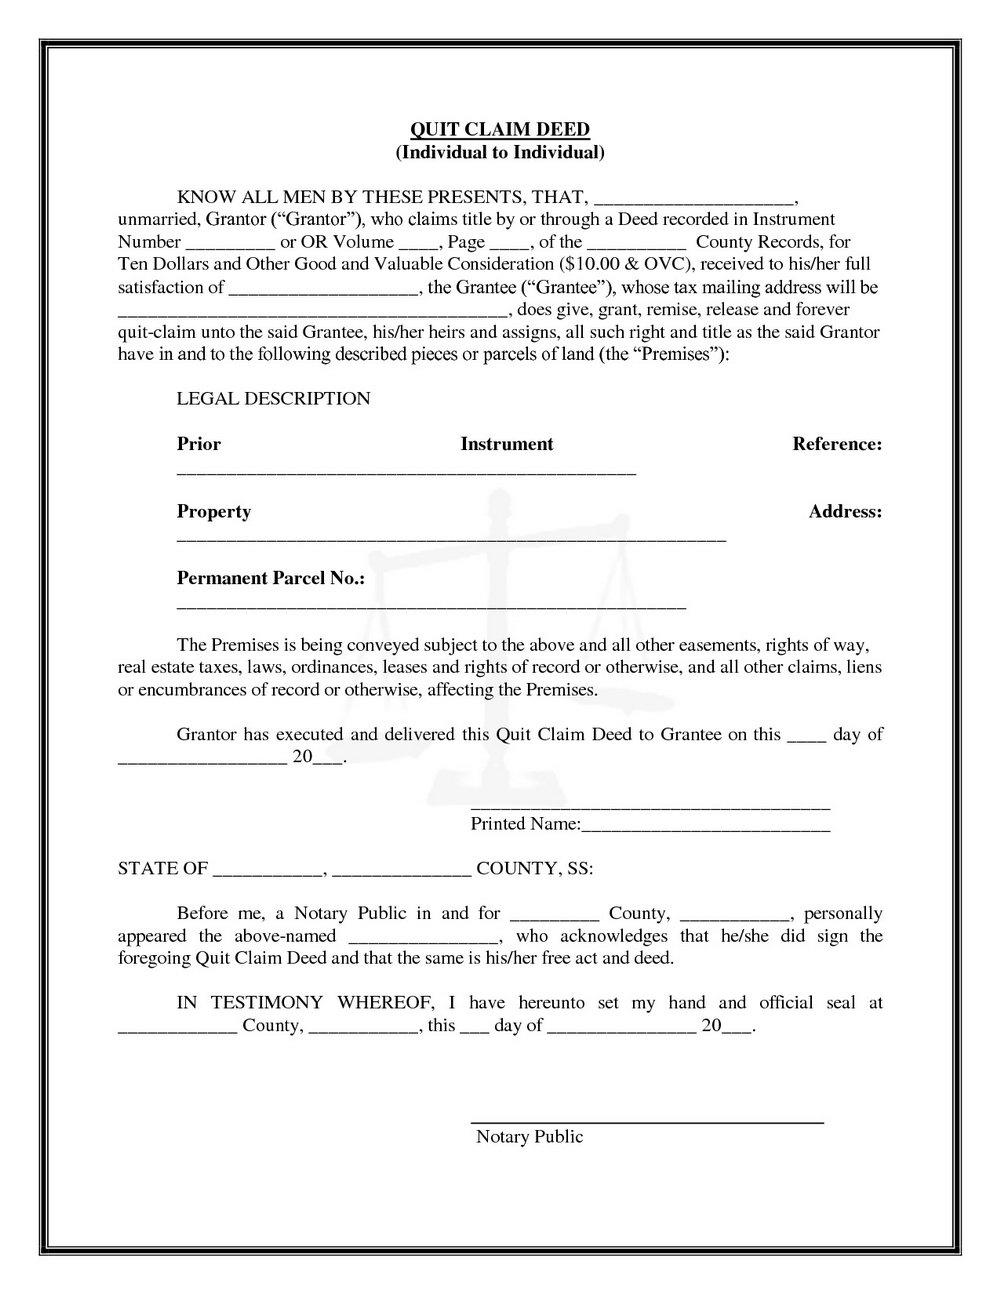 Quick Deed Claim Form Florida